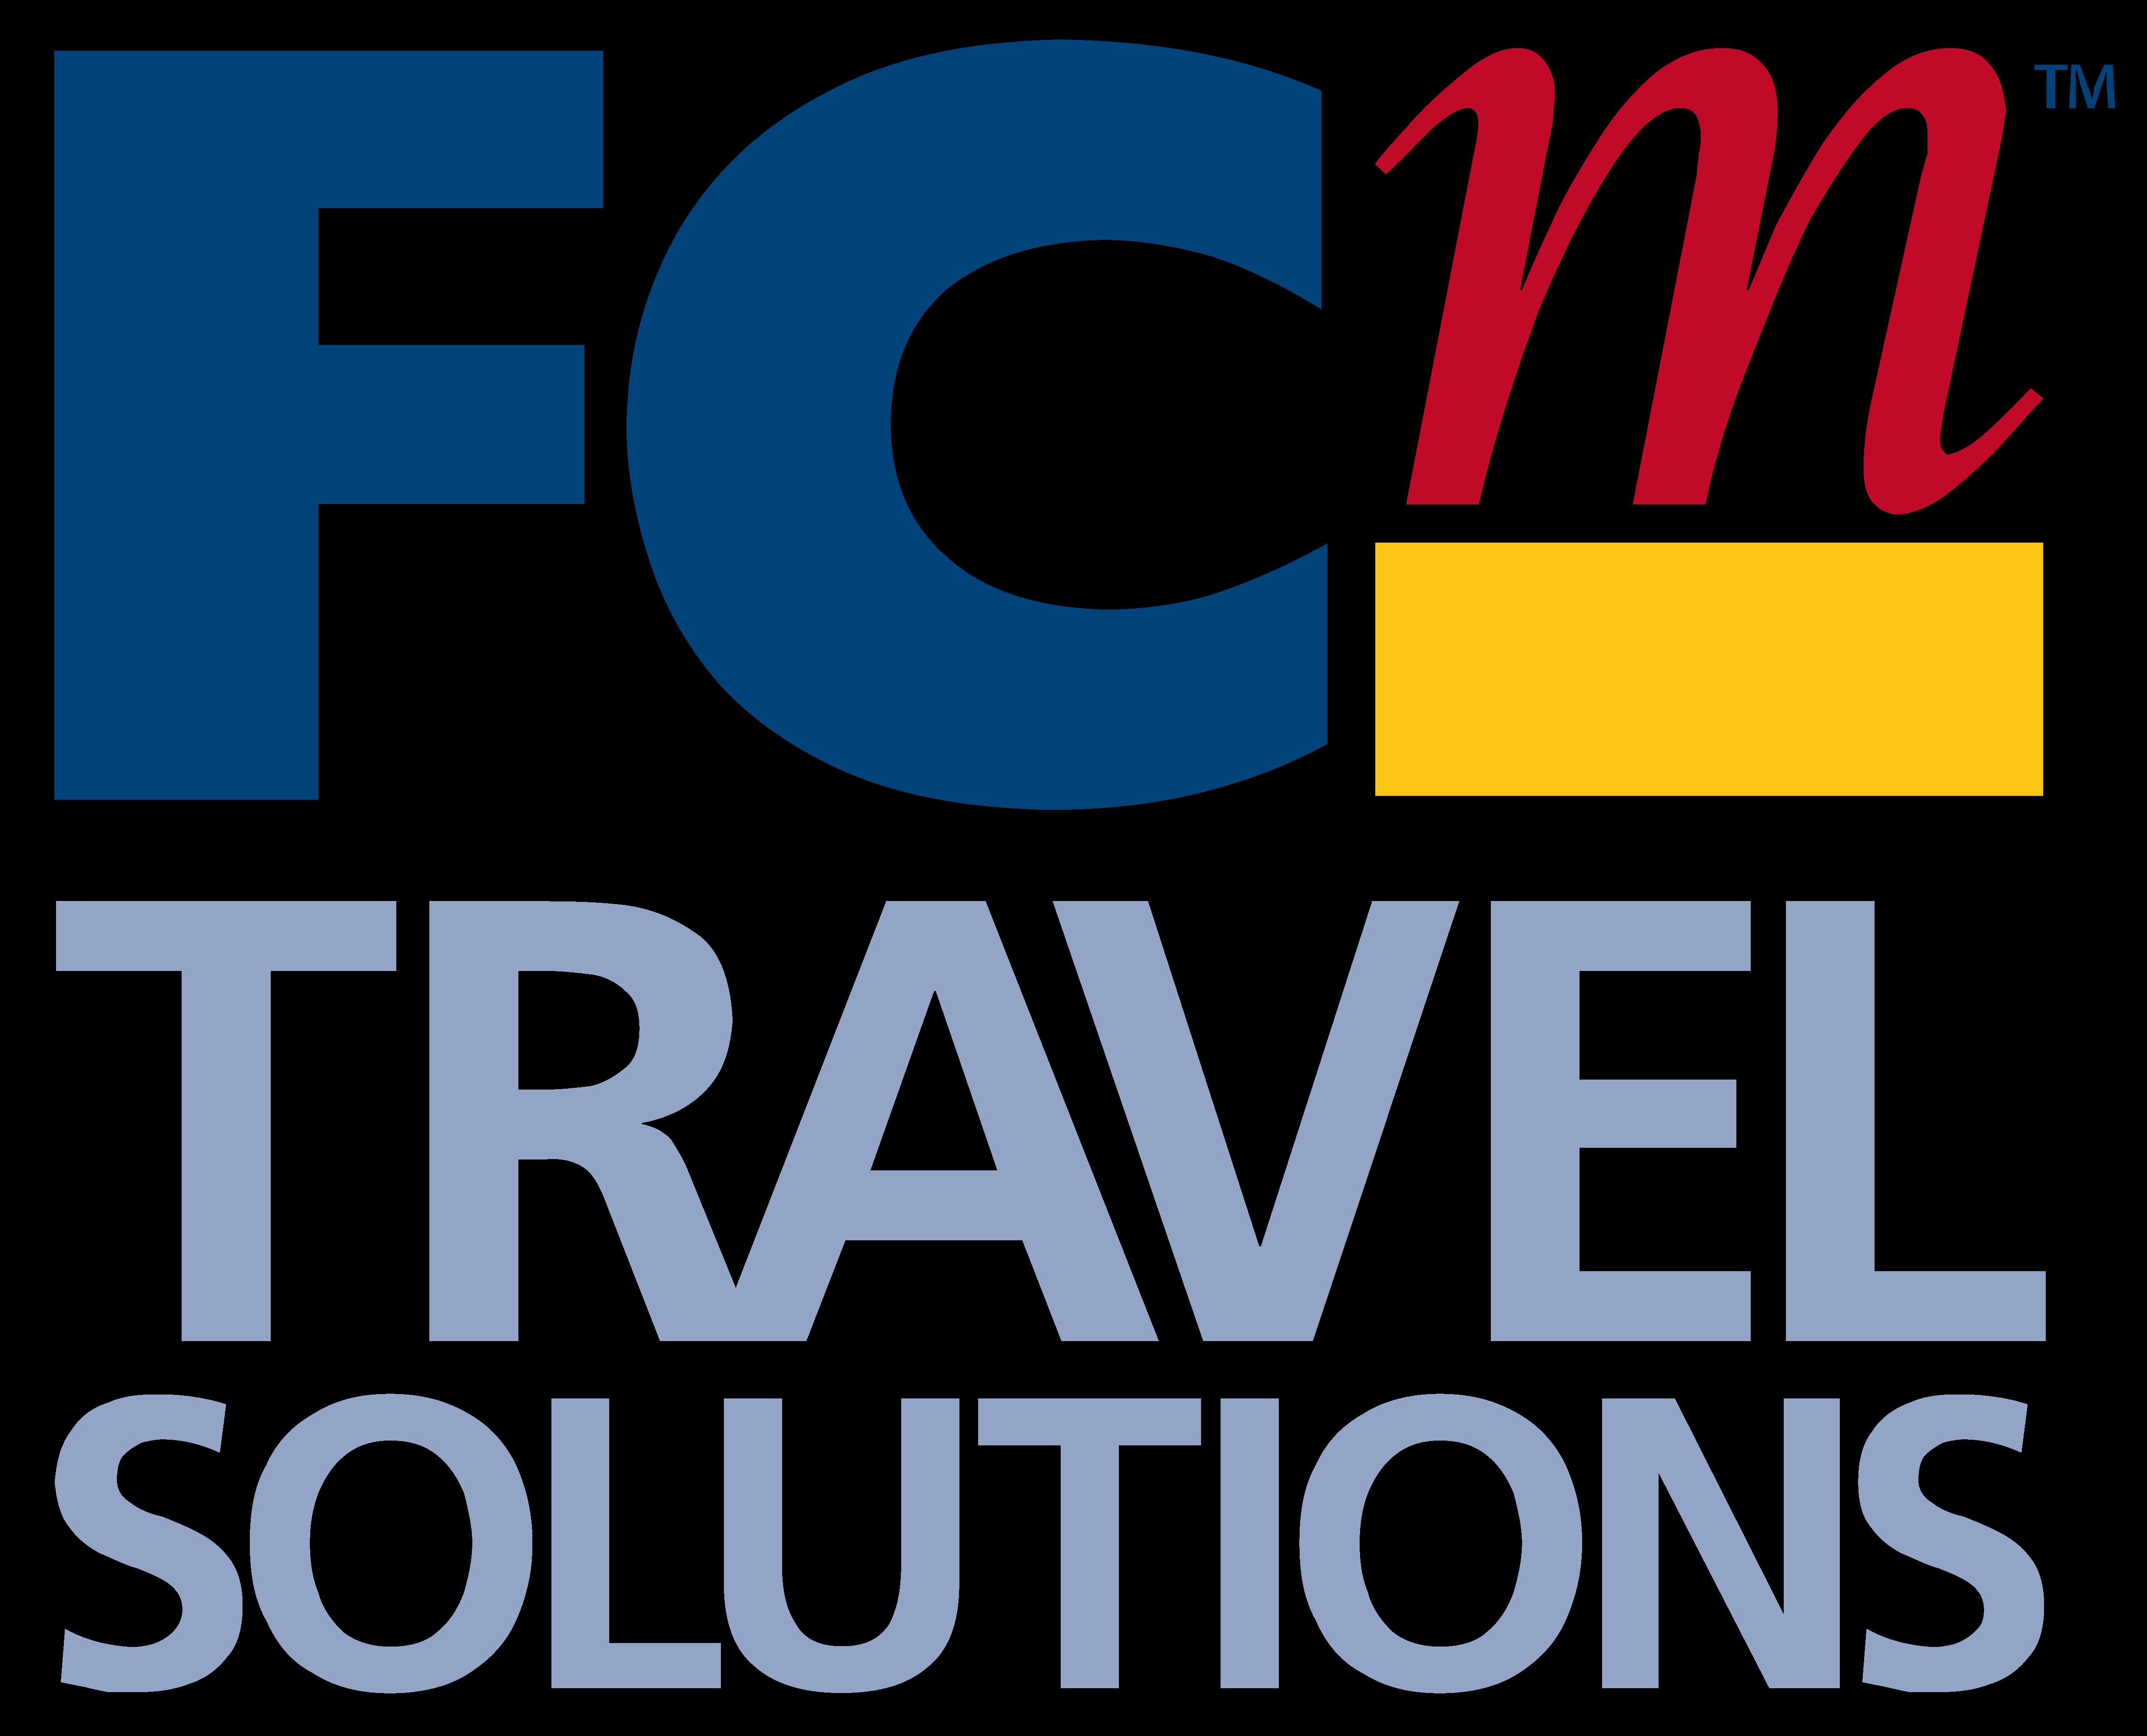 Fcm Travel Solutions - Gurgaon Image